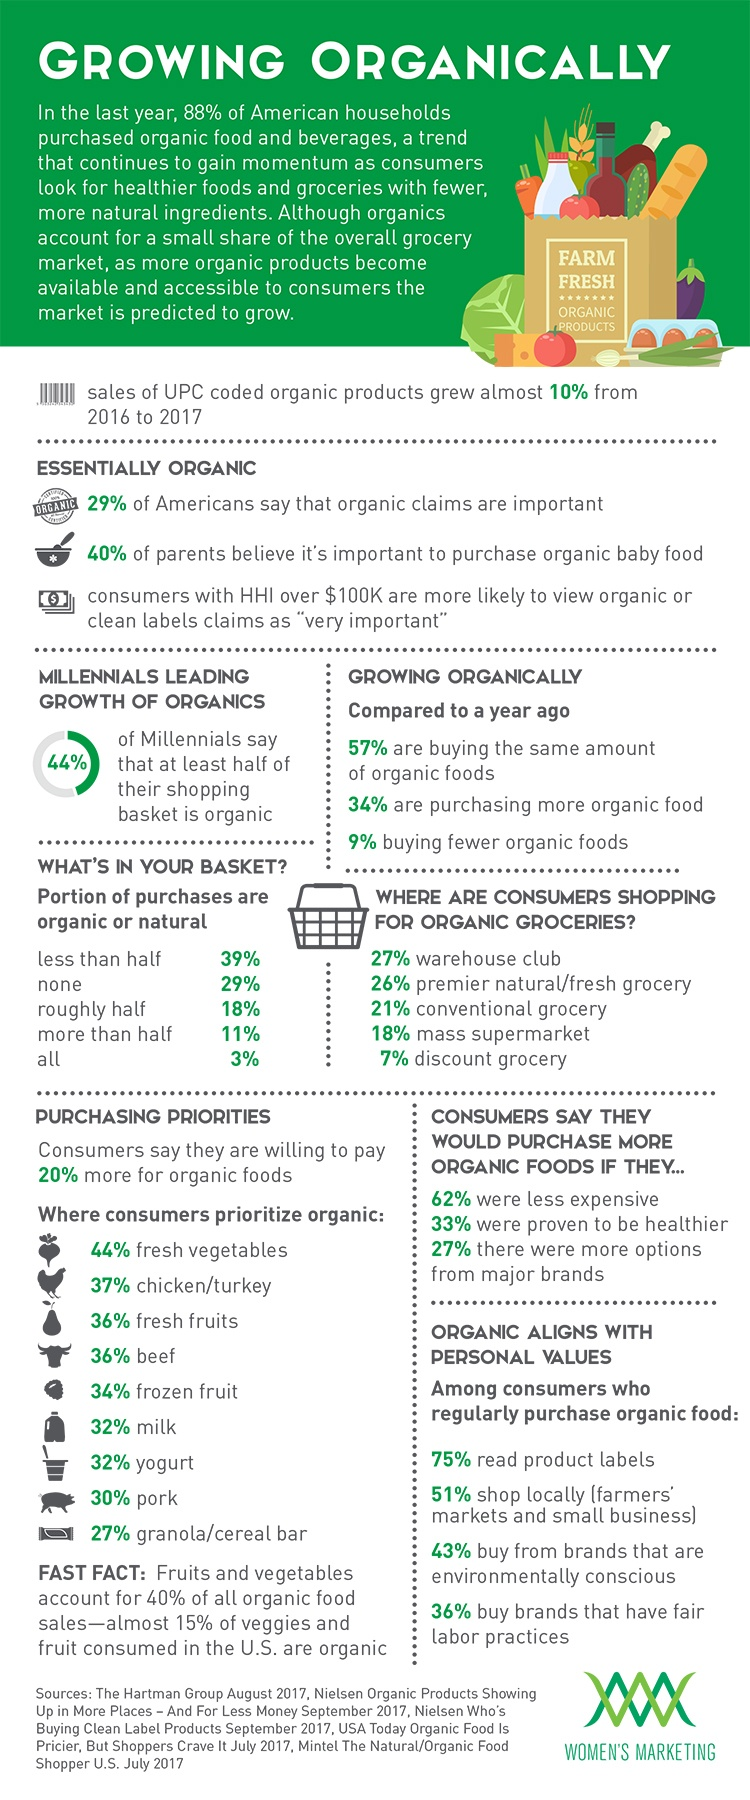 GrowingOrganically_Infographic.jpg